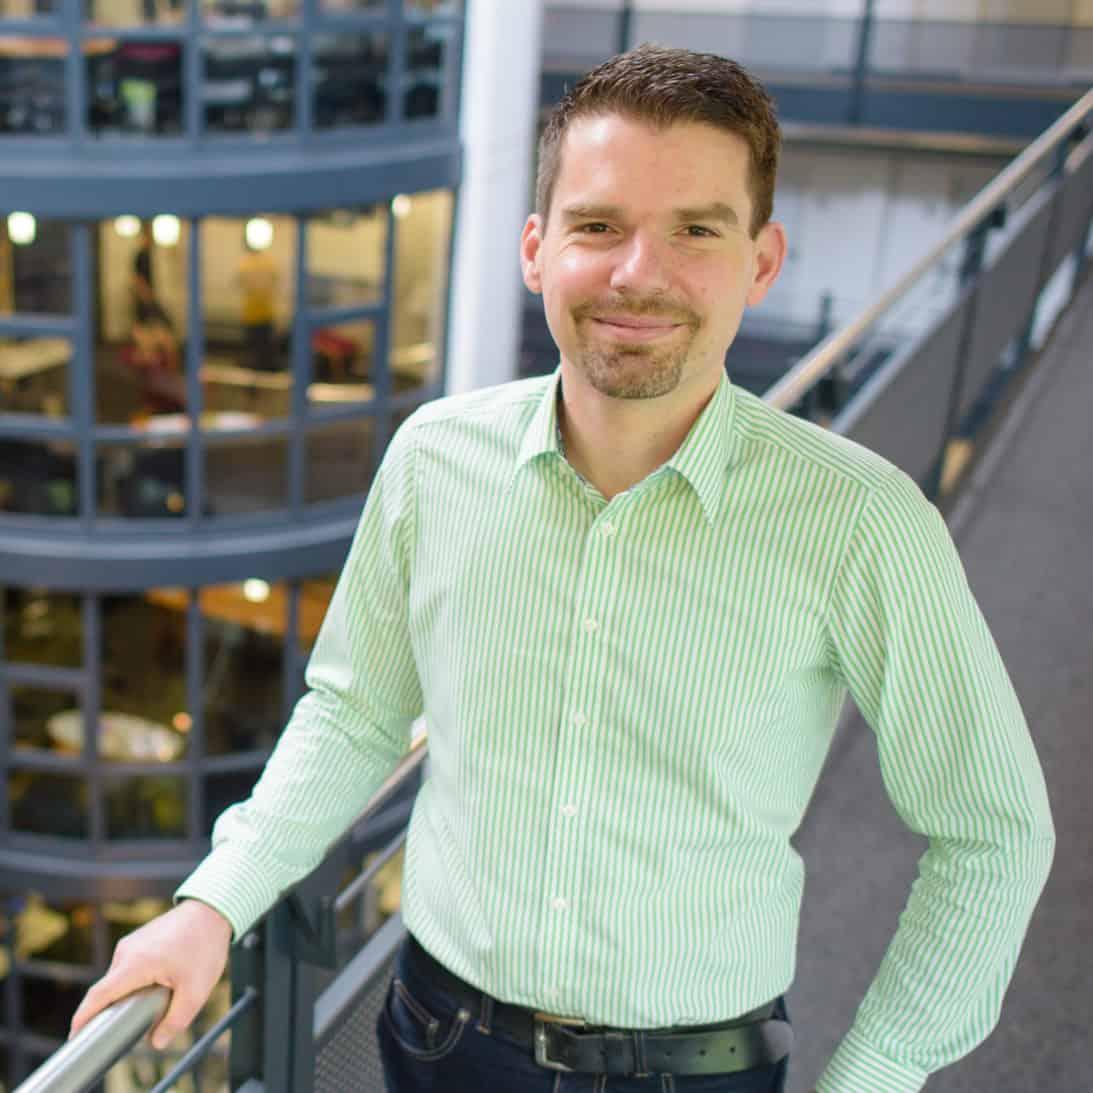 Prof. Dr. Theobald - Rise of AI